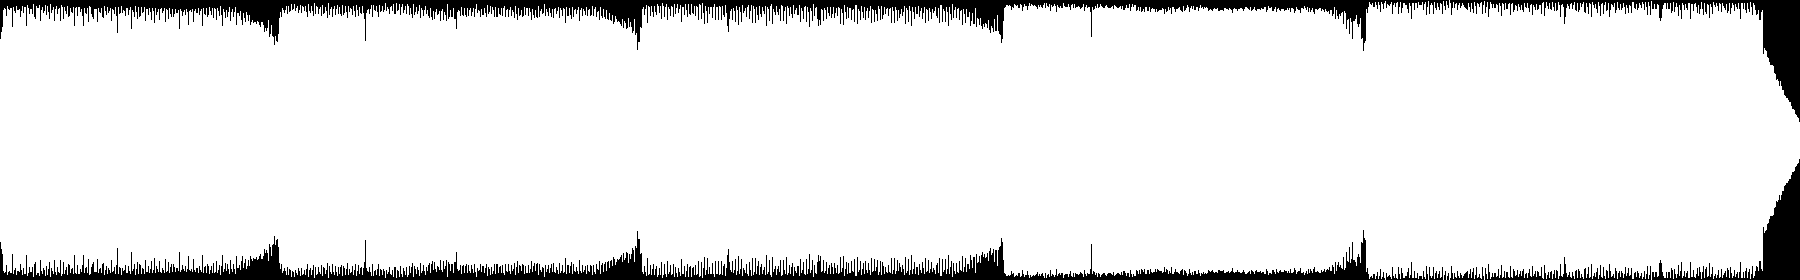 SUGO Trance Spire Presets audio waveform